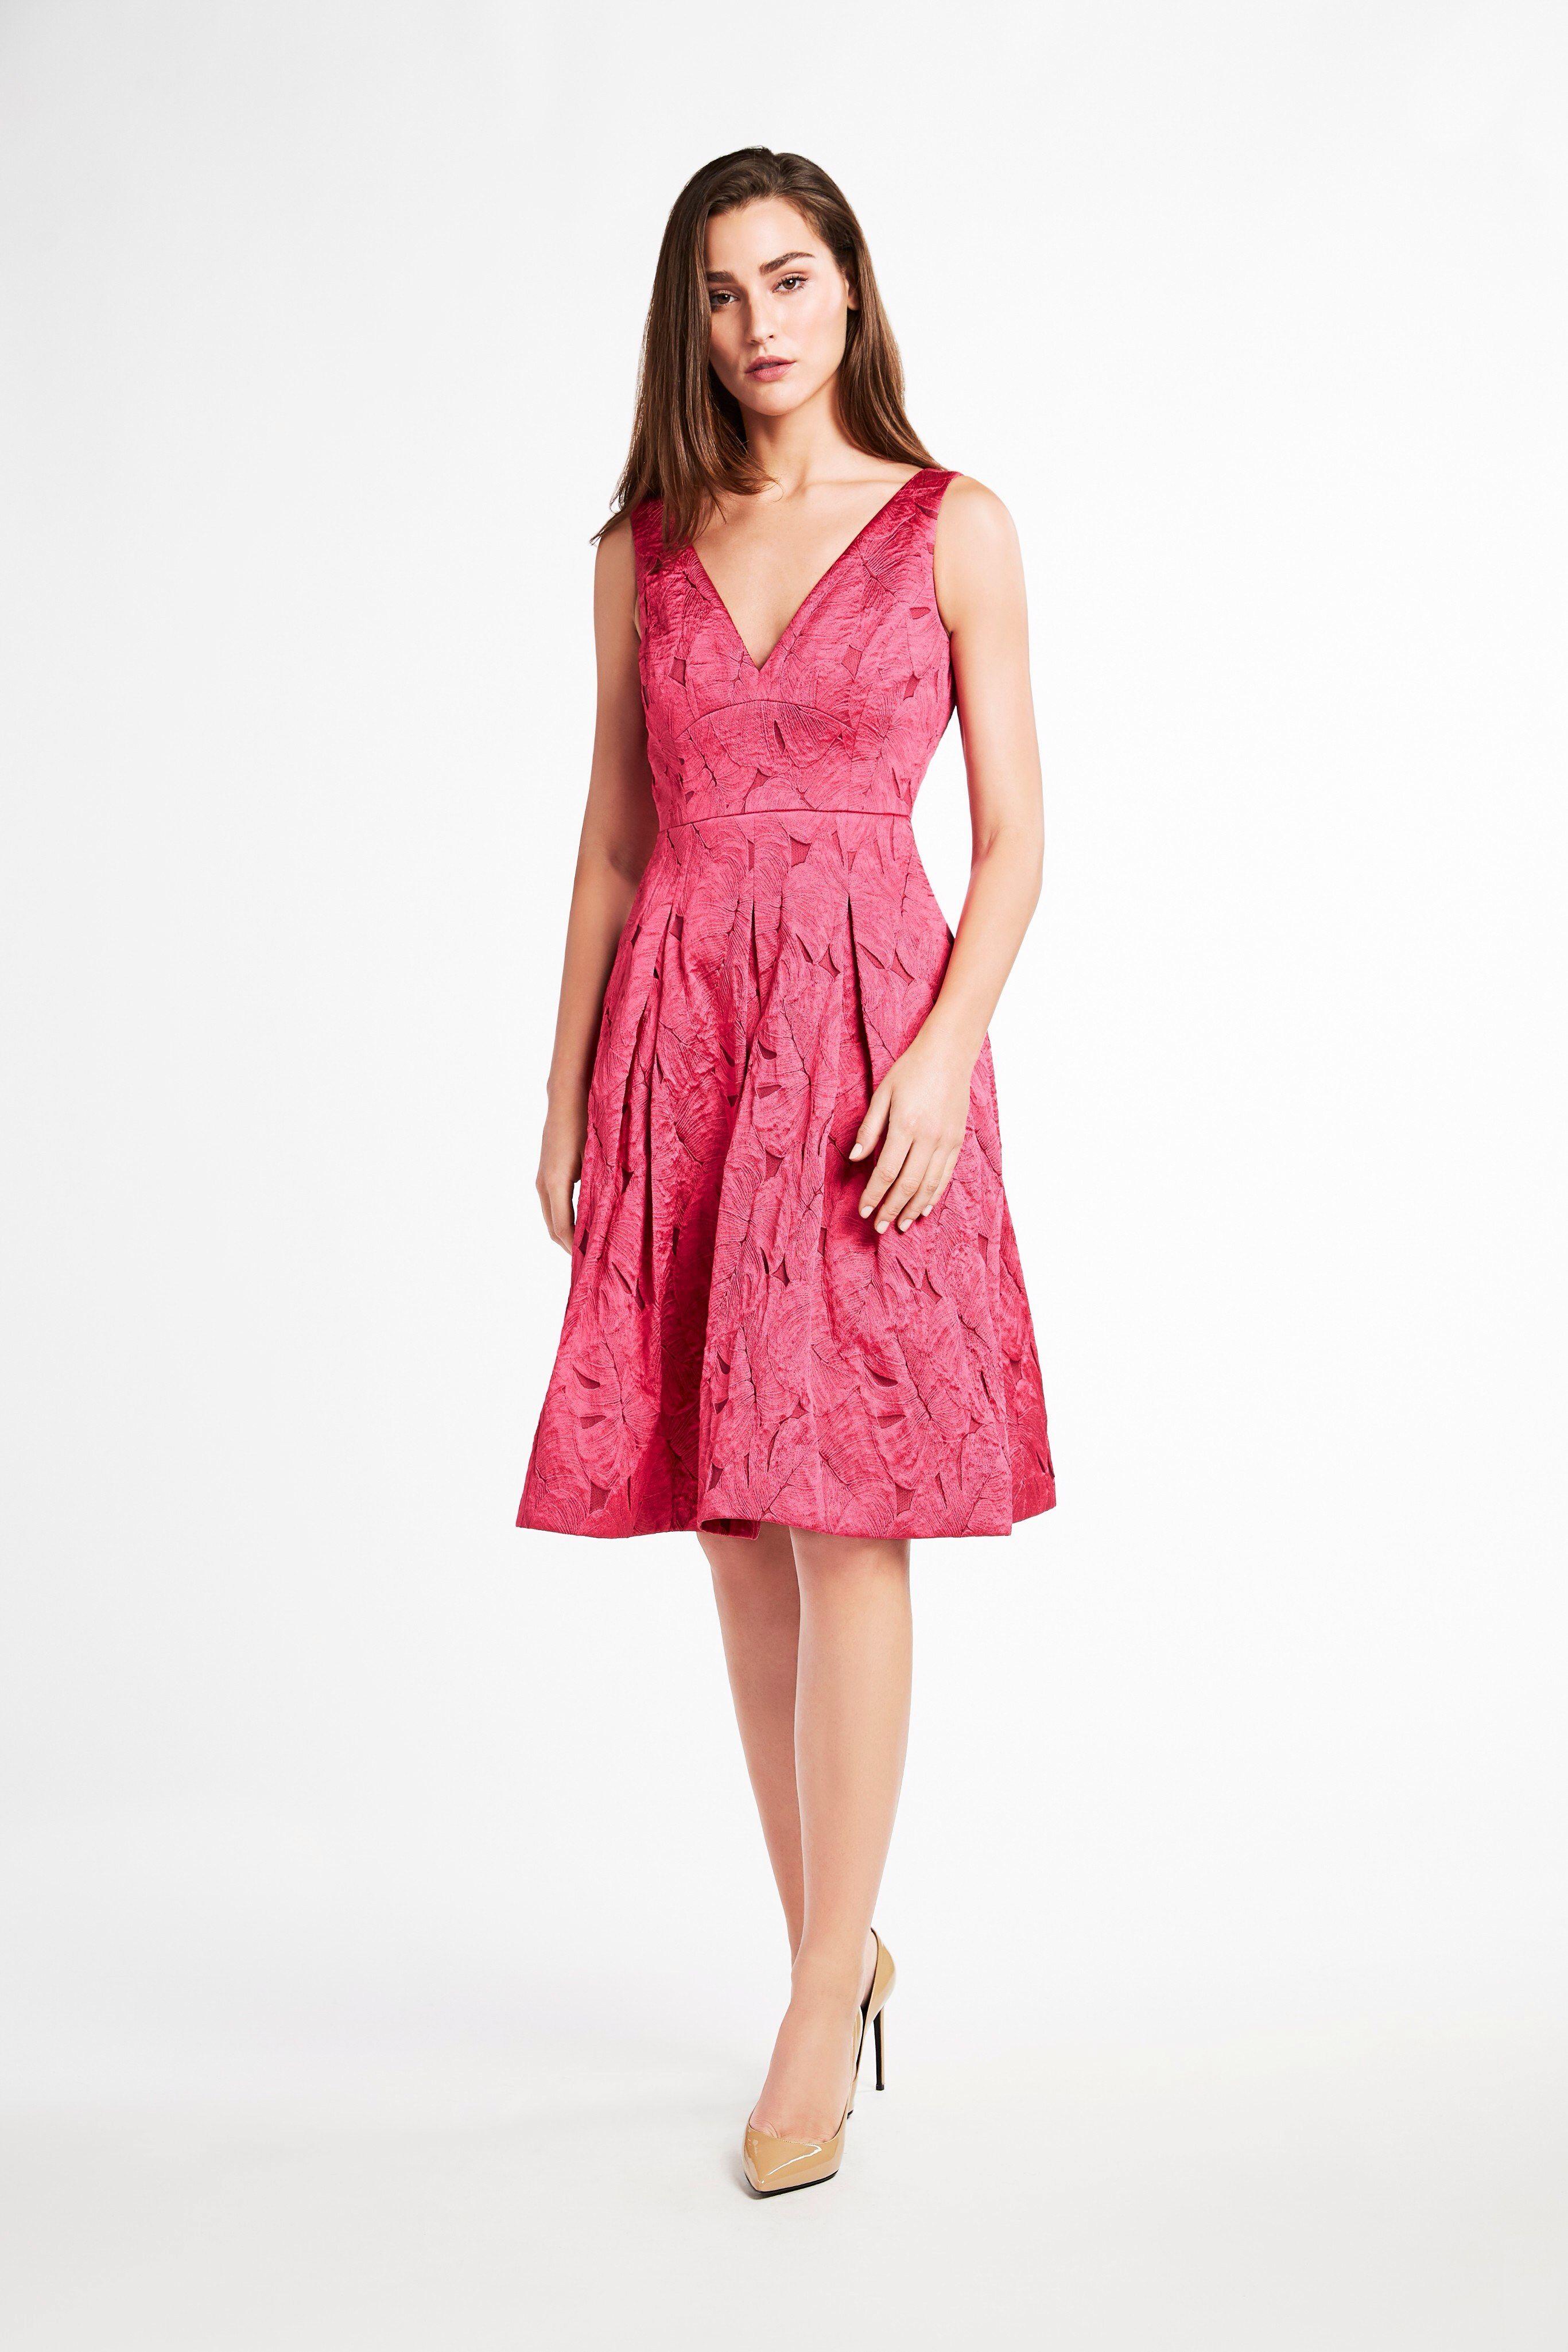 6d3ace27e67c6 Look 10 Elie Tahari, Summer Dresses, Formal Dresses, Fashion Brands, Fashion  Show